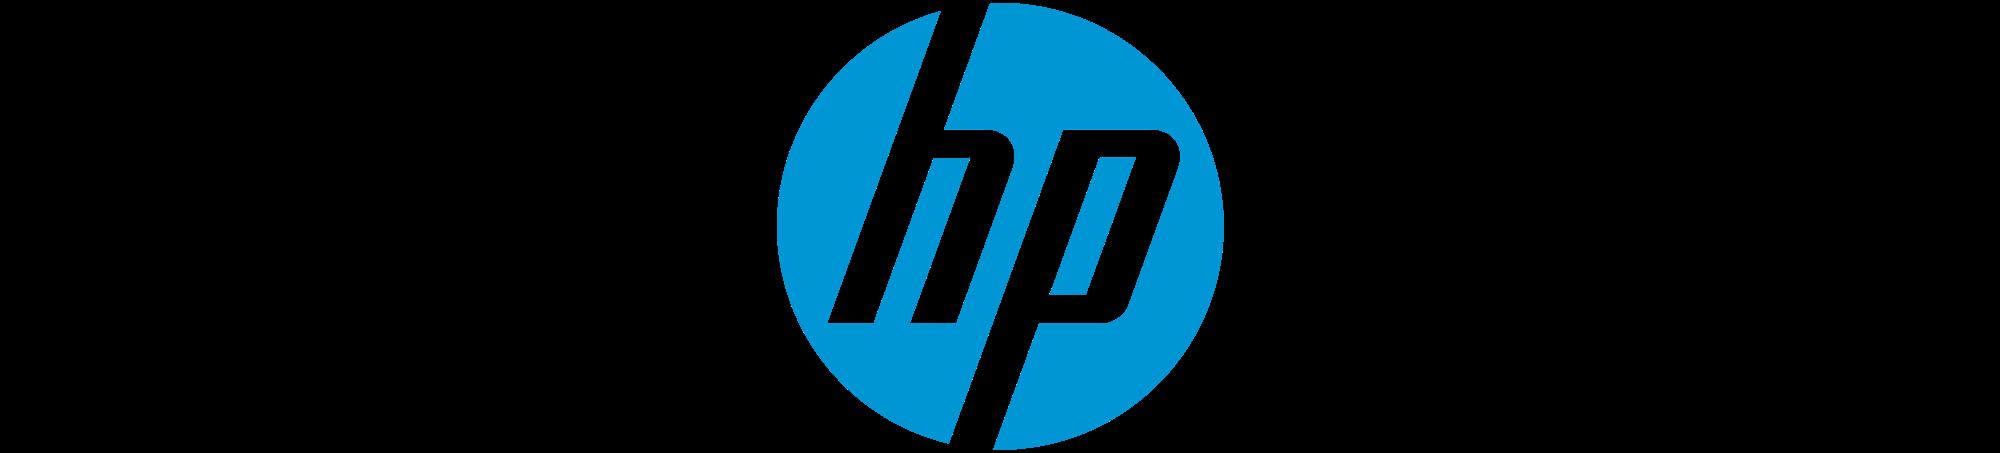 Logo Hp Inc PNG Transparent Logo Hp Inc.PNG Images. | PlusPNG